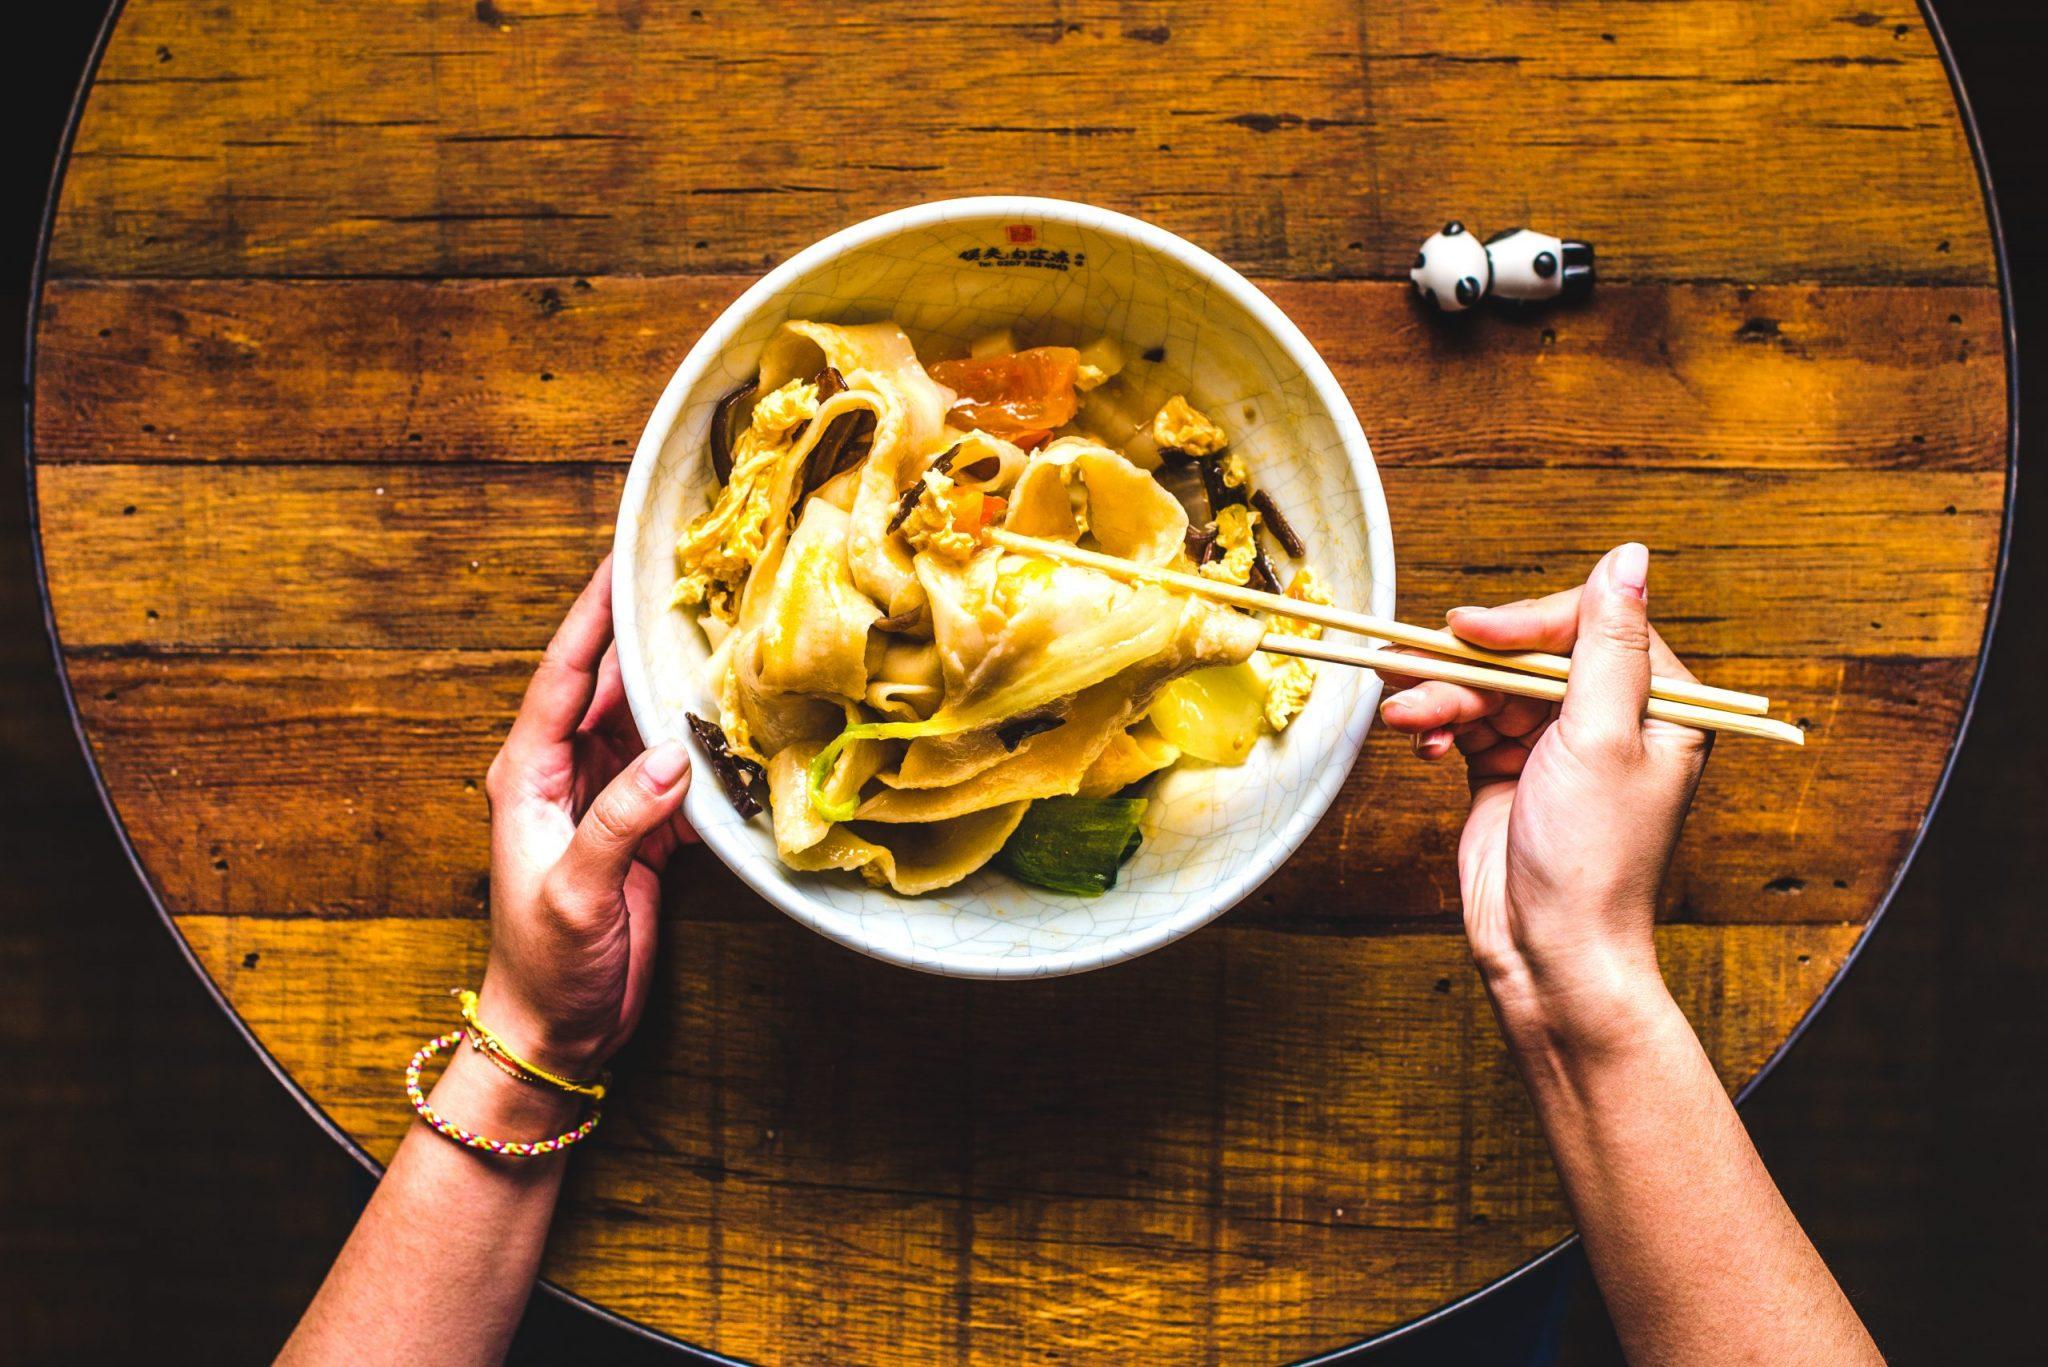 London's best Restaurants reopening 17th May indoor dining  Murger Han | Photo: Karolina Wiercigroch